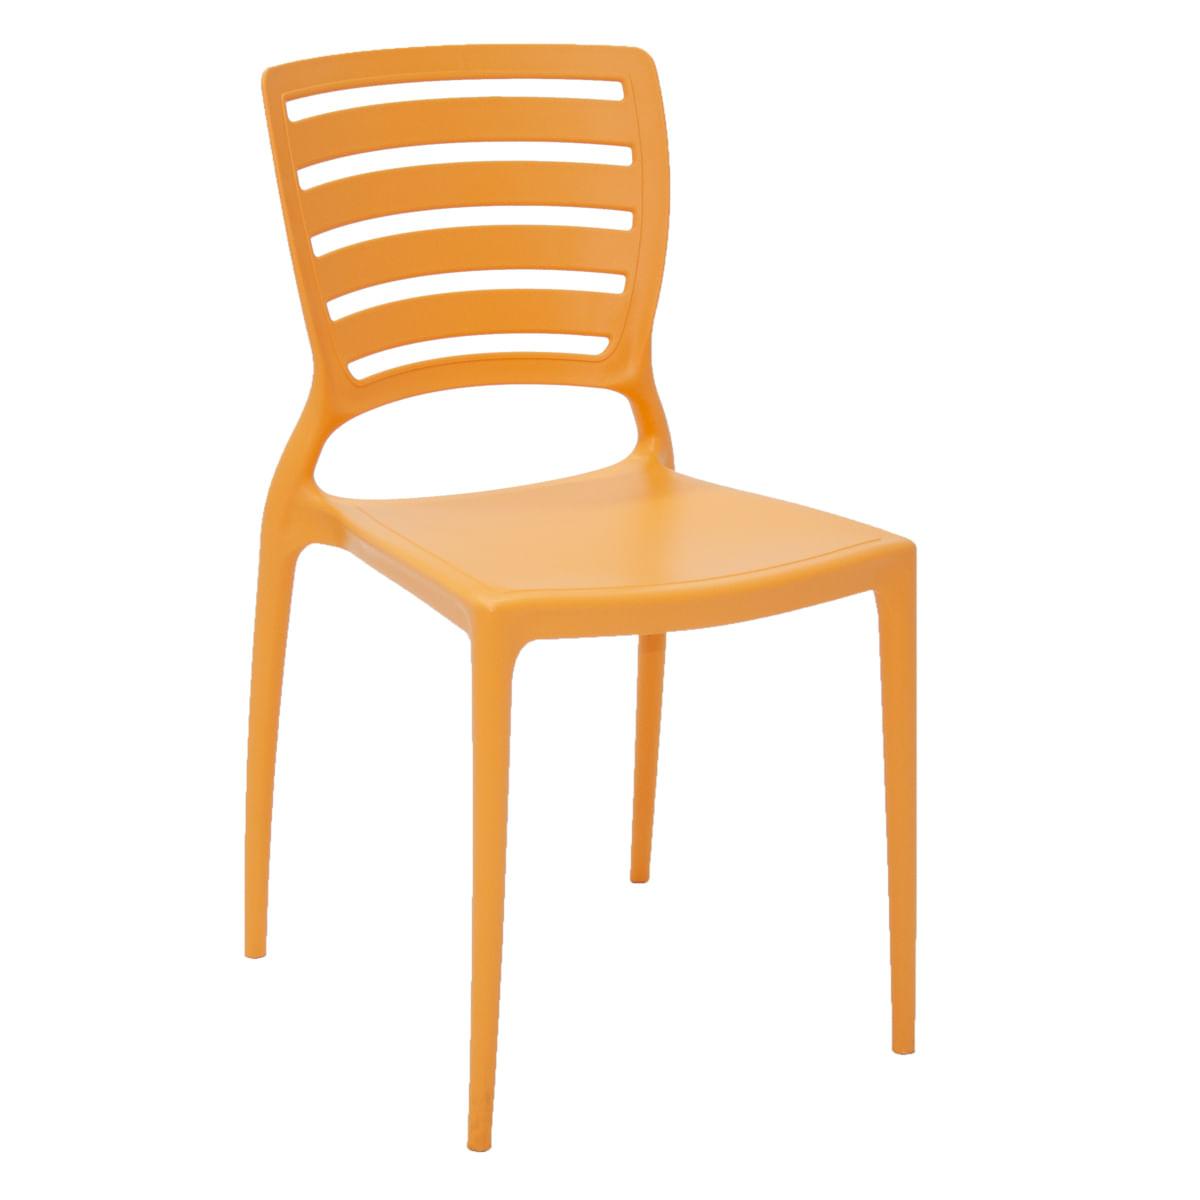 Cadeira Sofia encosto horizontal laranja Tramontina 92237090